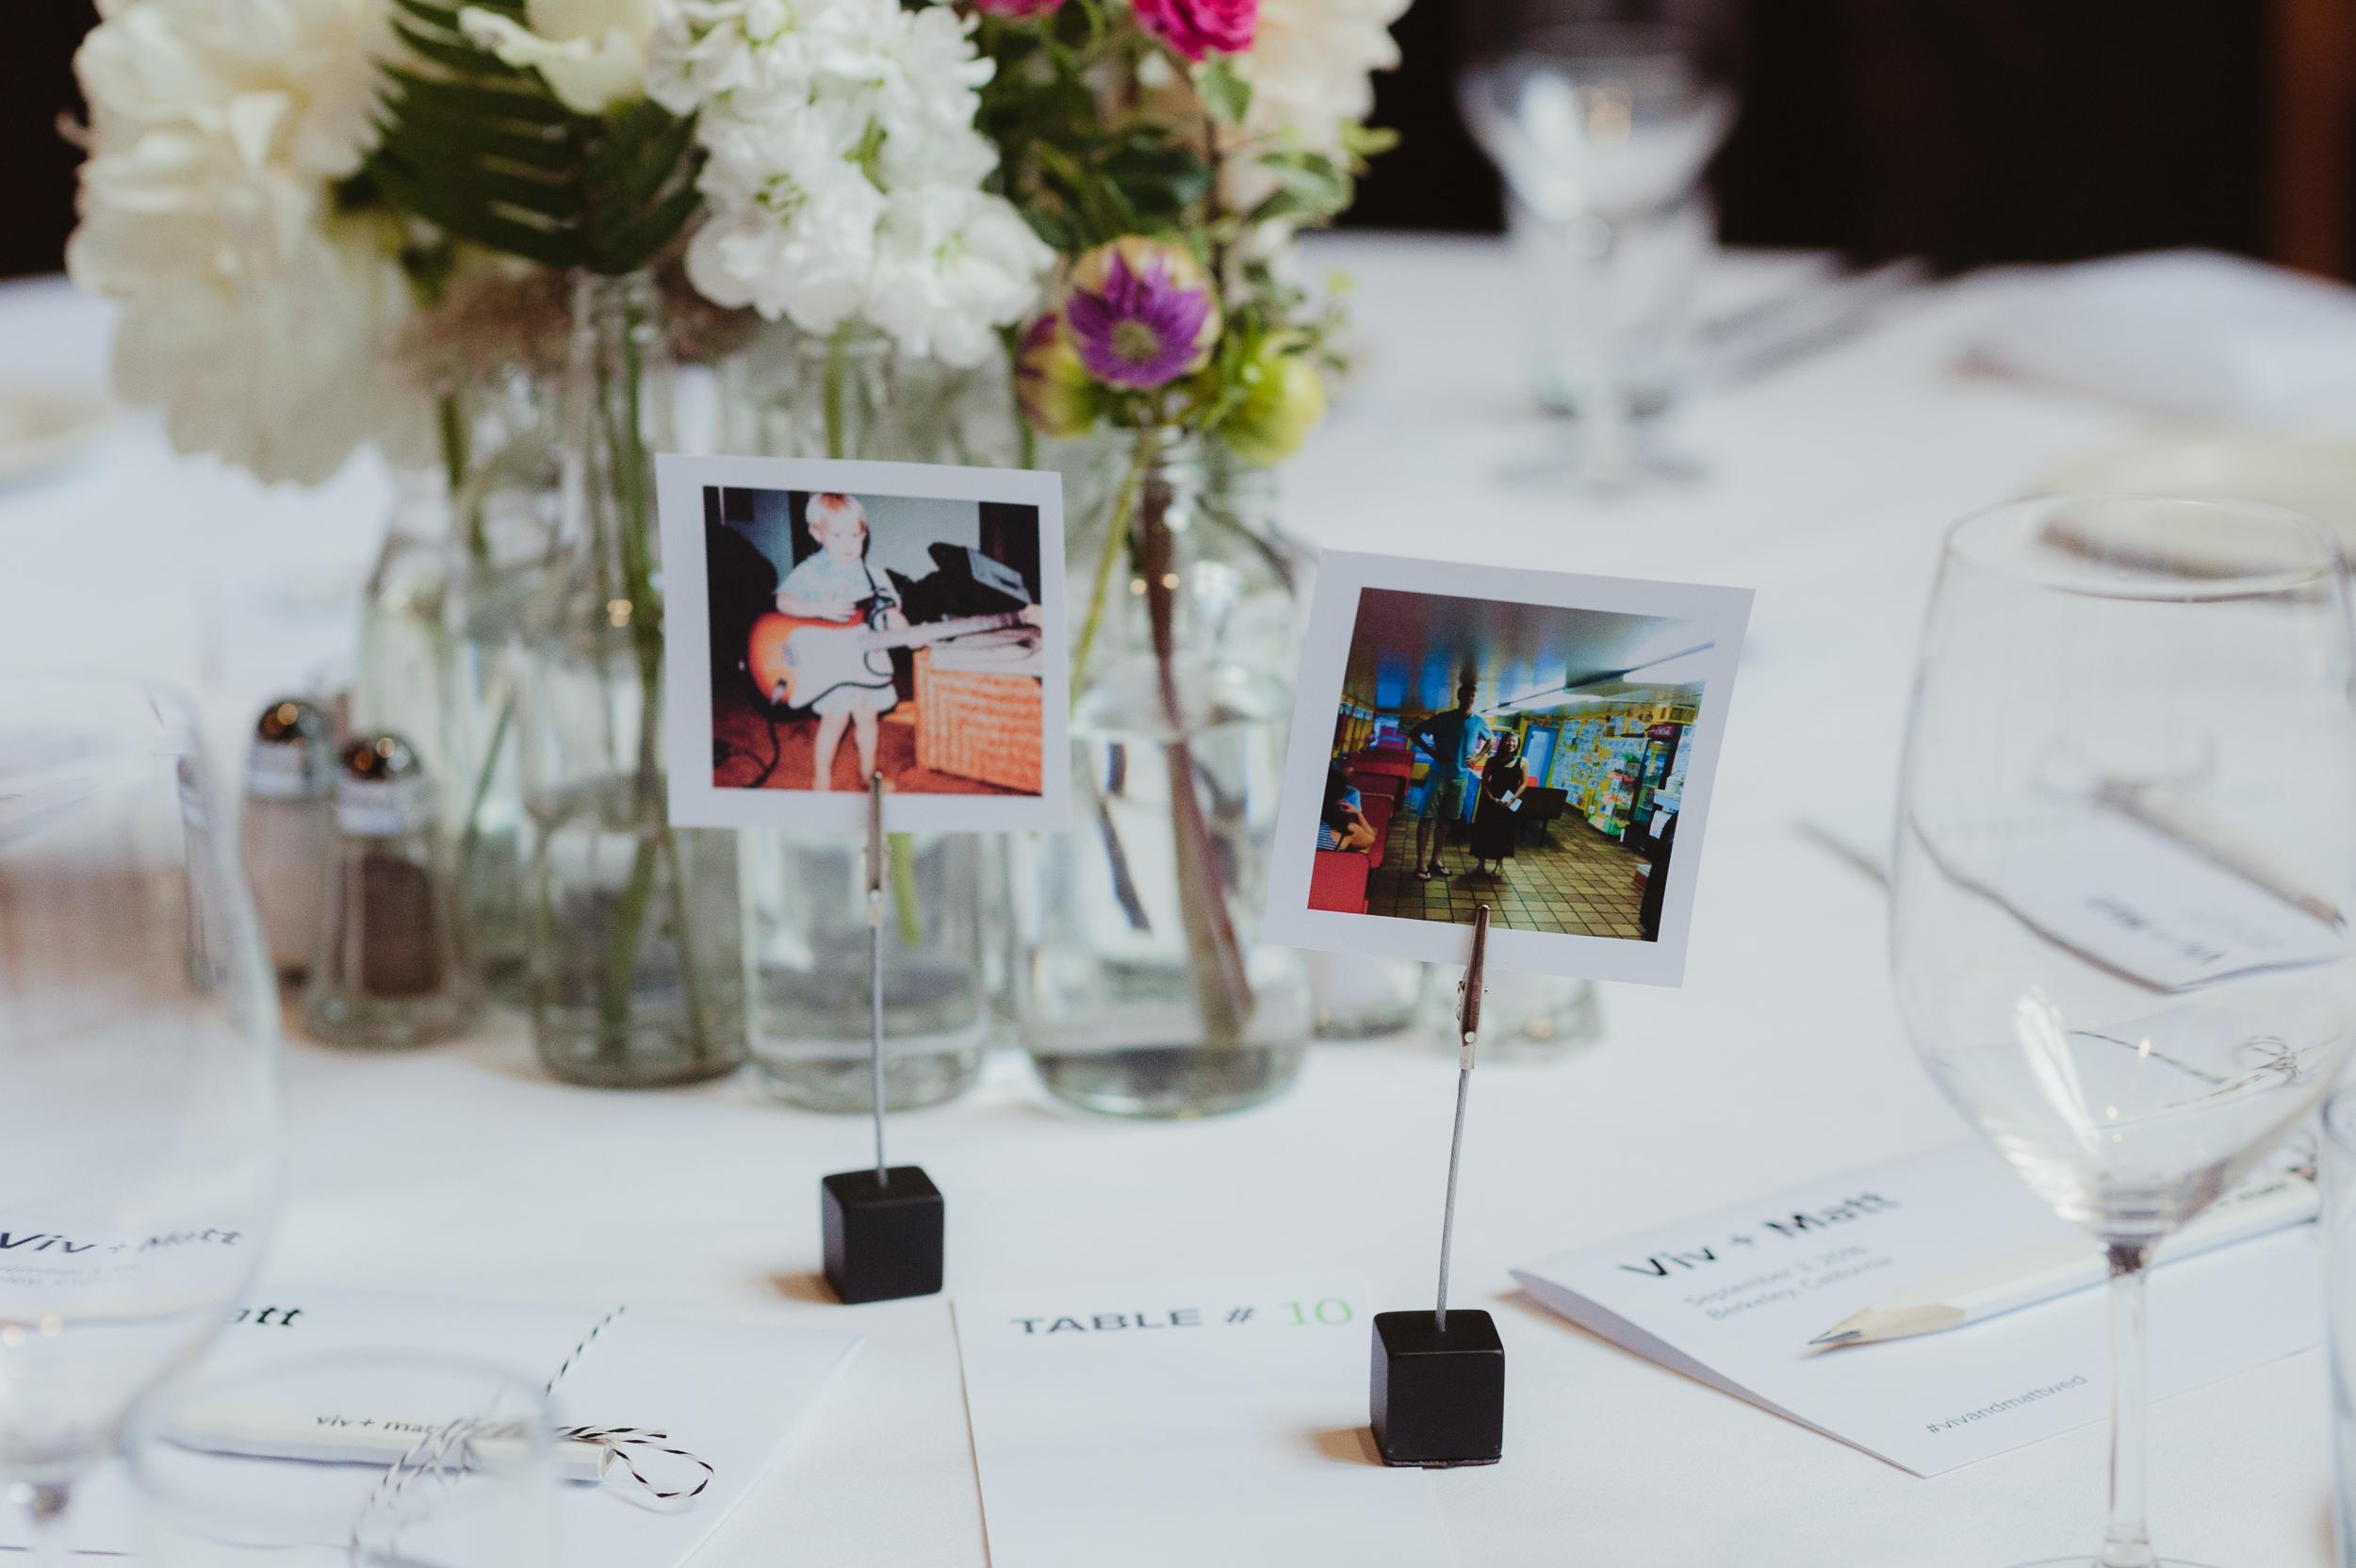 faculty-club-berkeley-wedding-photographer-vc068.jpg